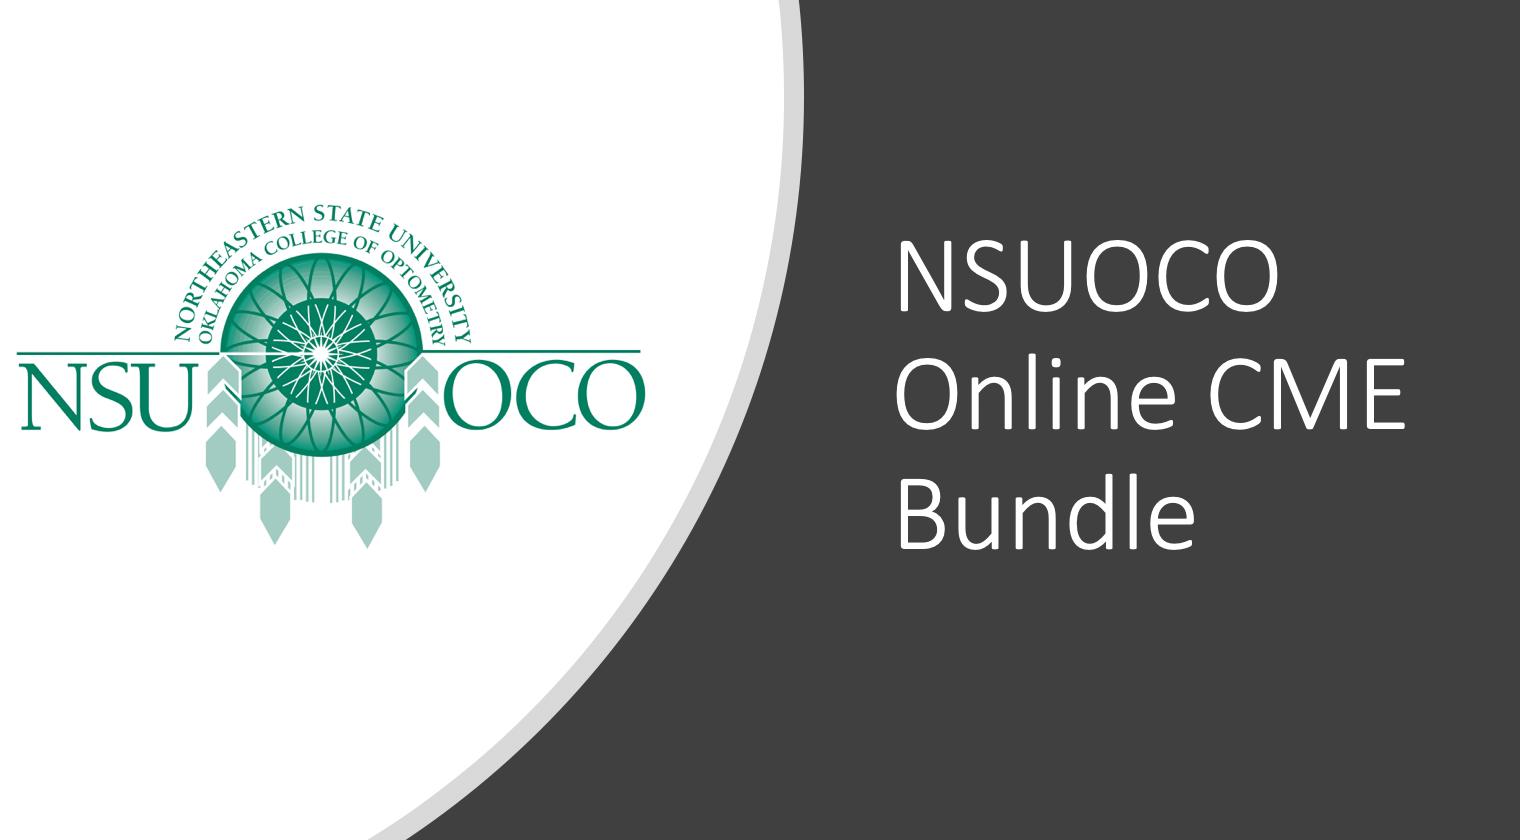 JP + NSUOCO Online Course Program